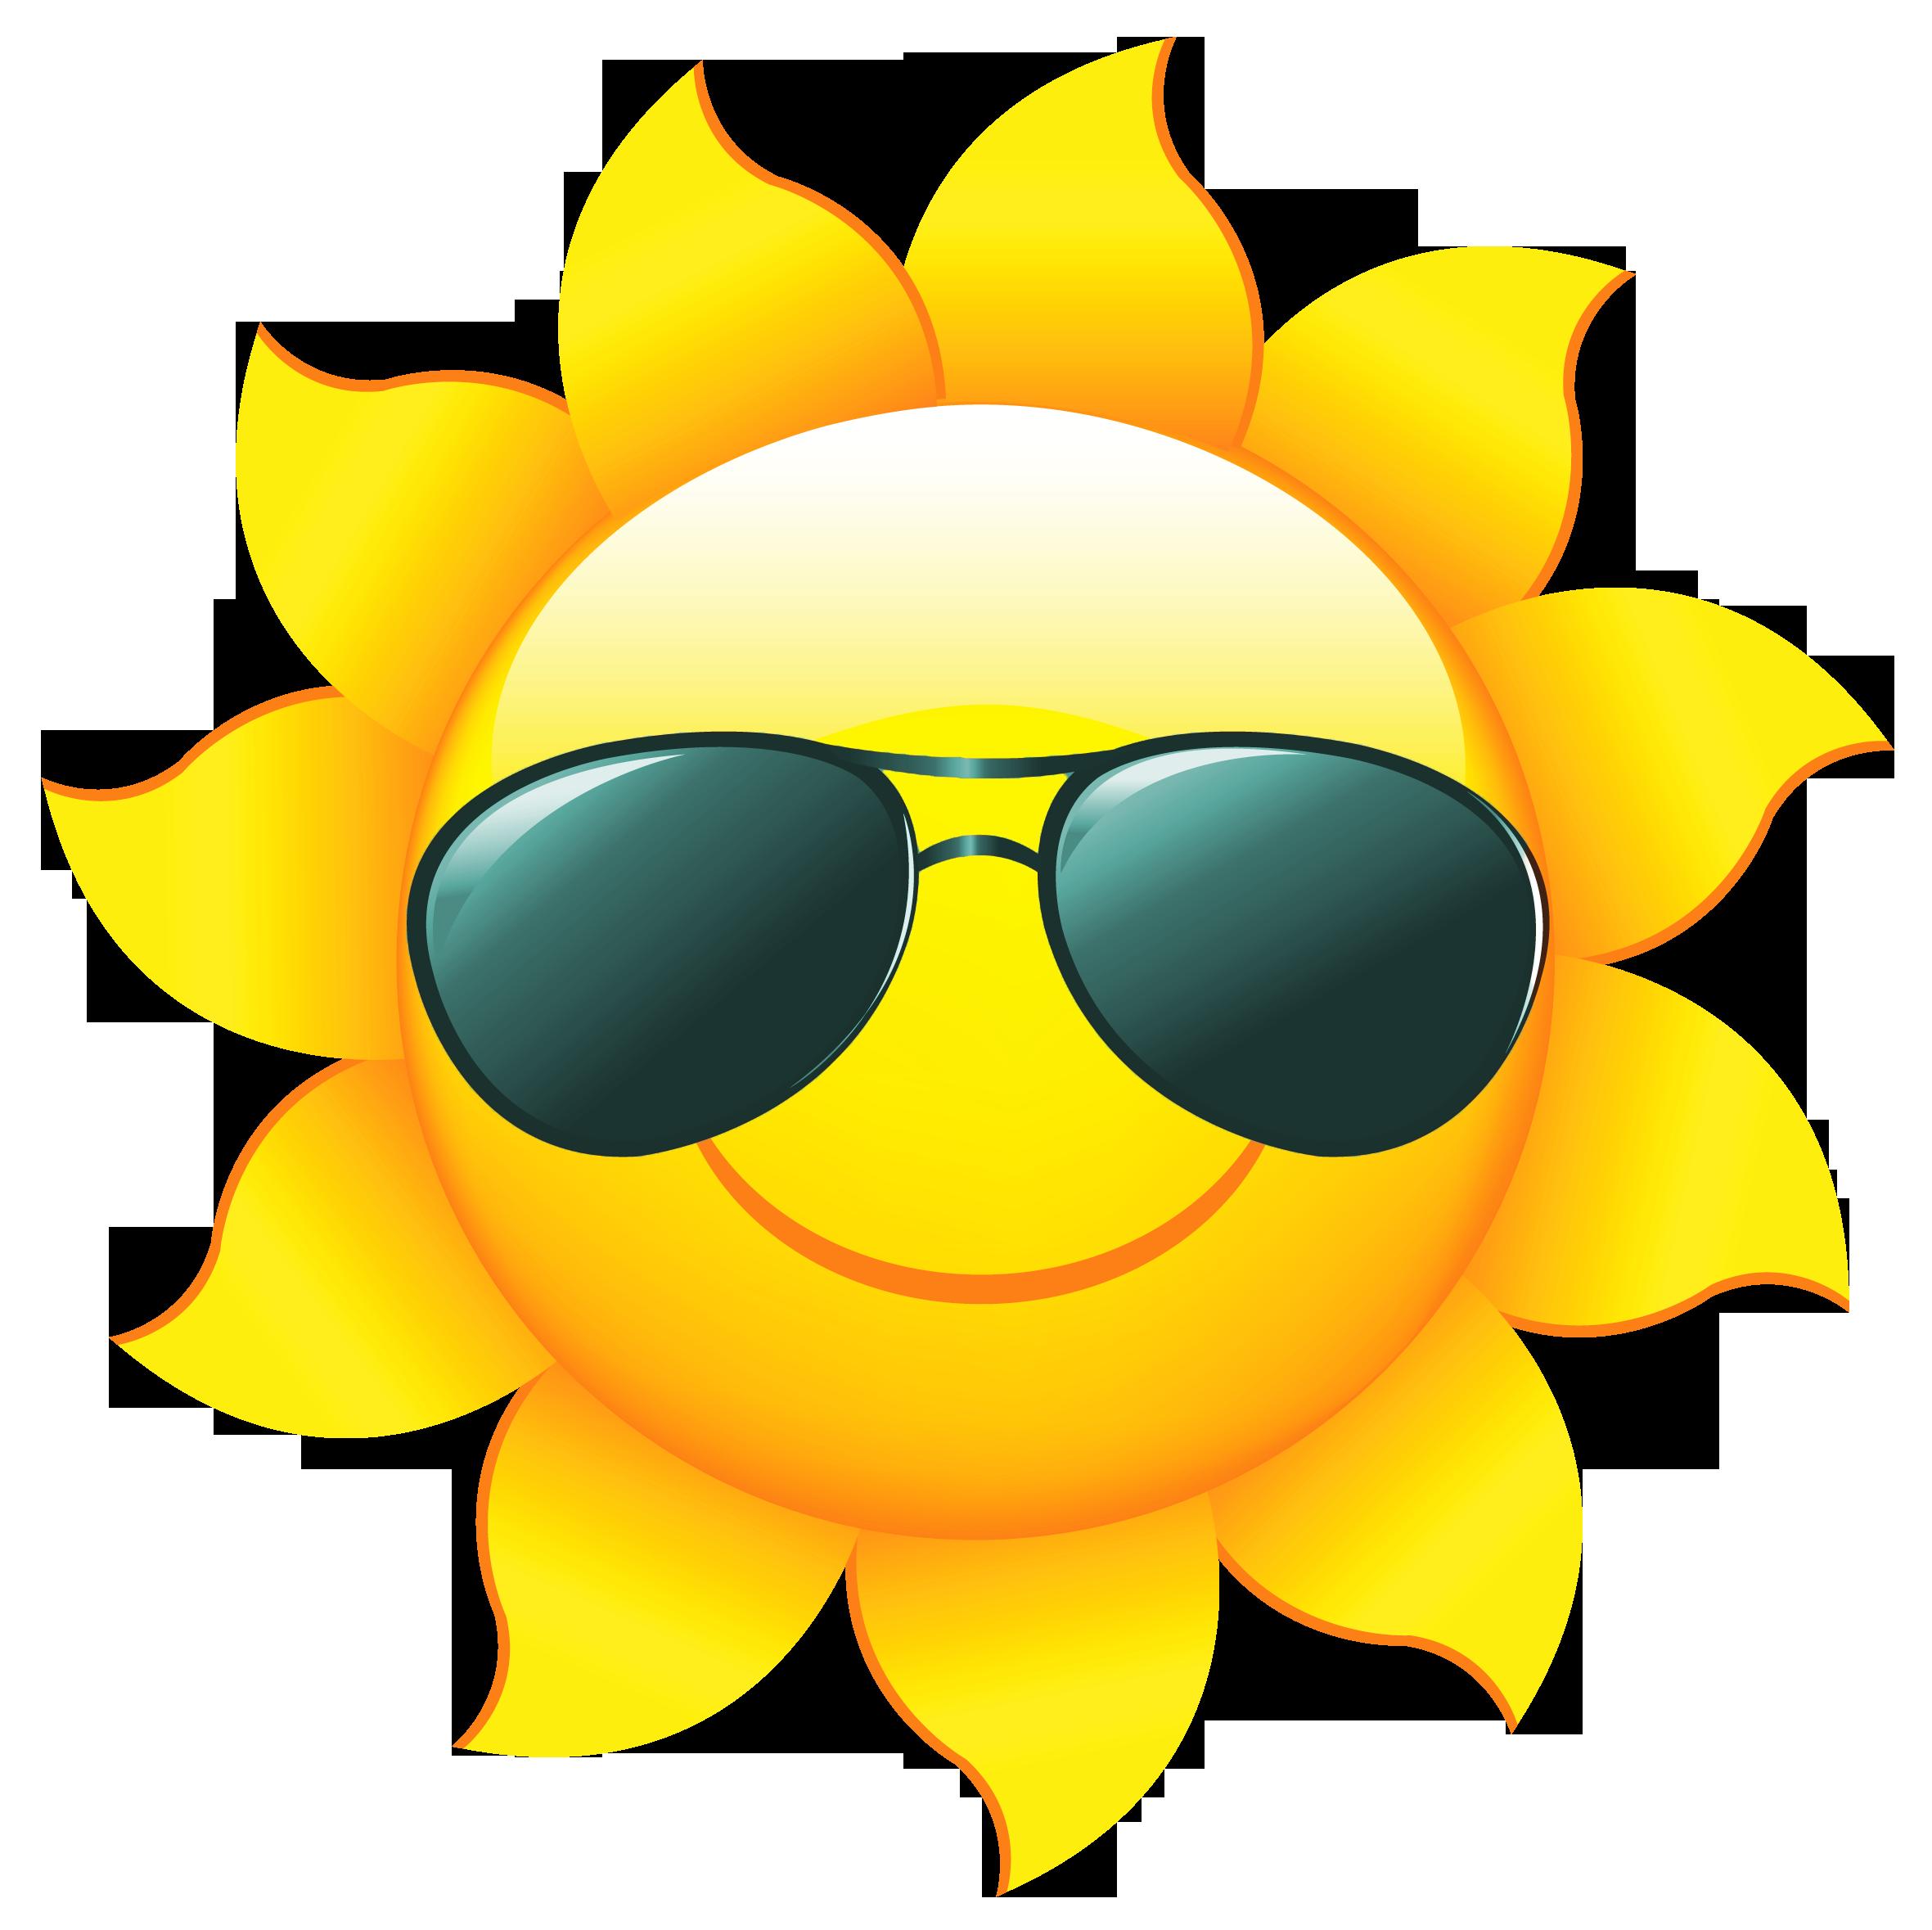 Sunshine Sun Clip Art With Transparent Background Free - Sun PNG Transparent Background